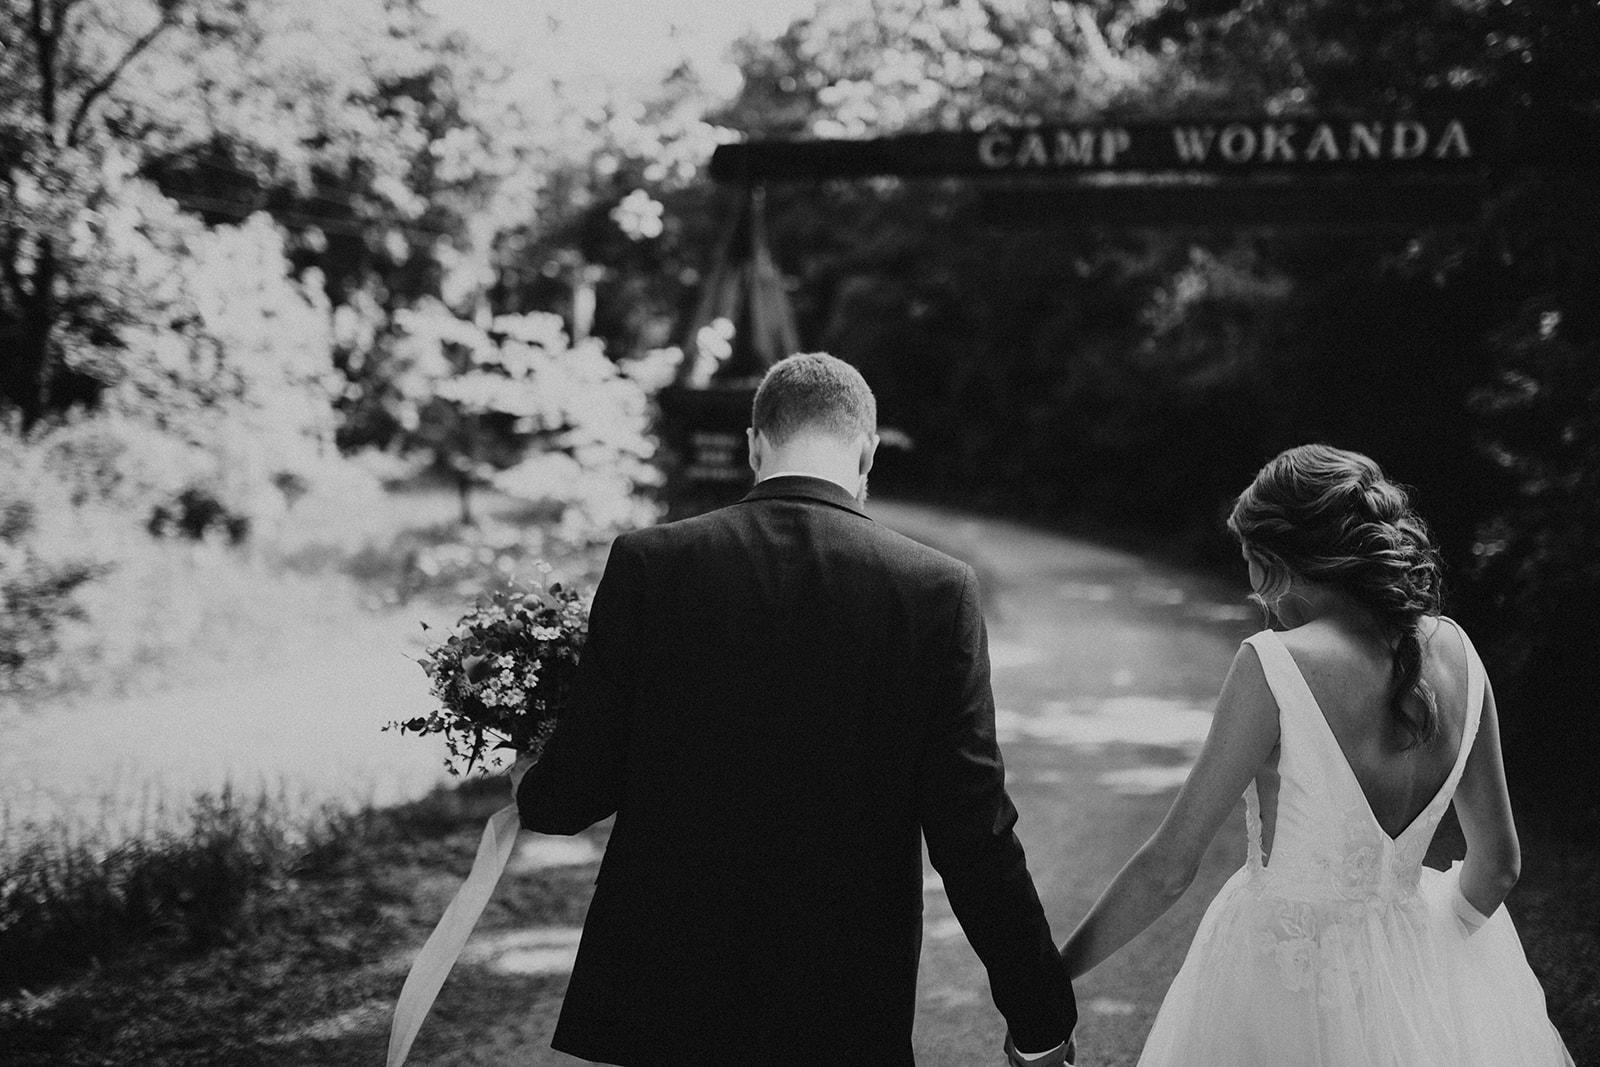 camp_wokanda_peoria_illinois_wedding_photographer_wright_photographs_bliese_0665.jpg